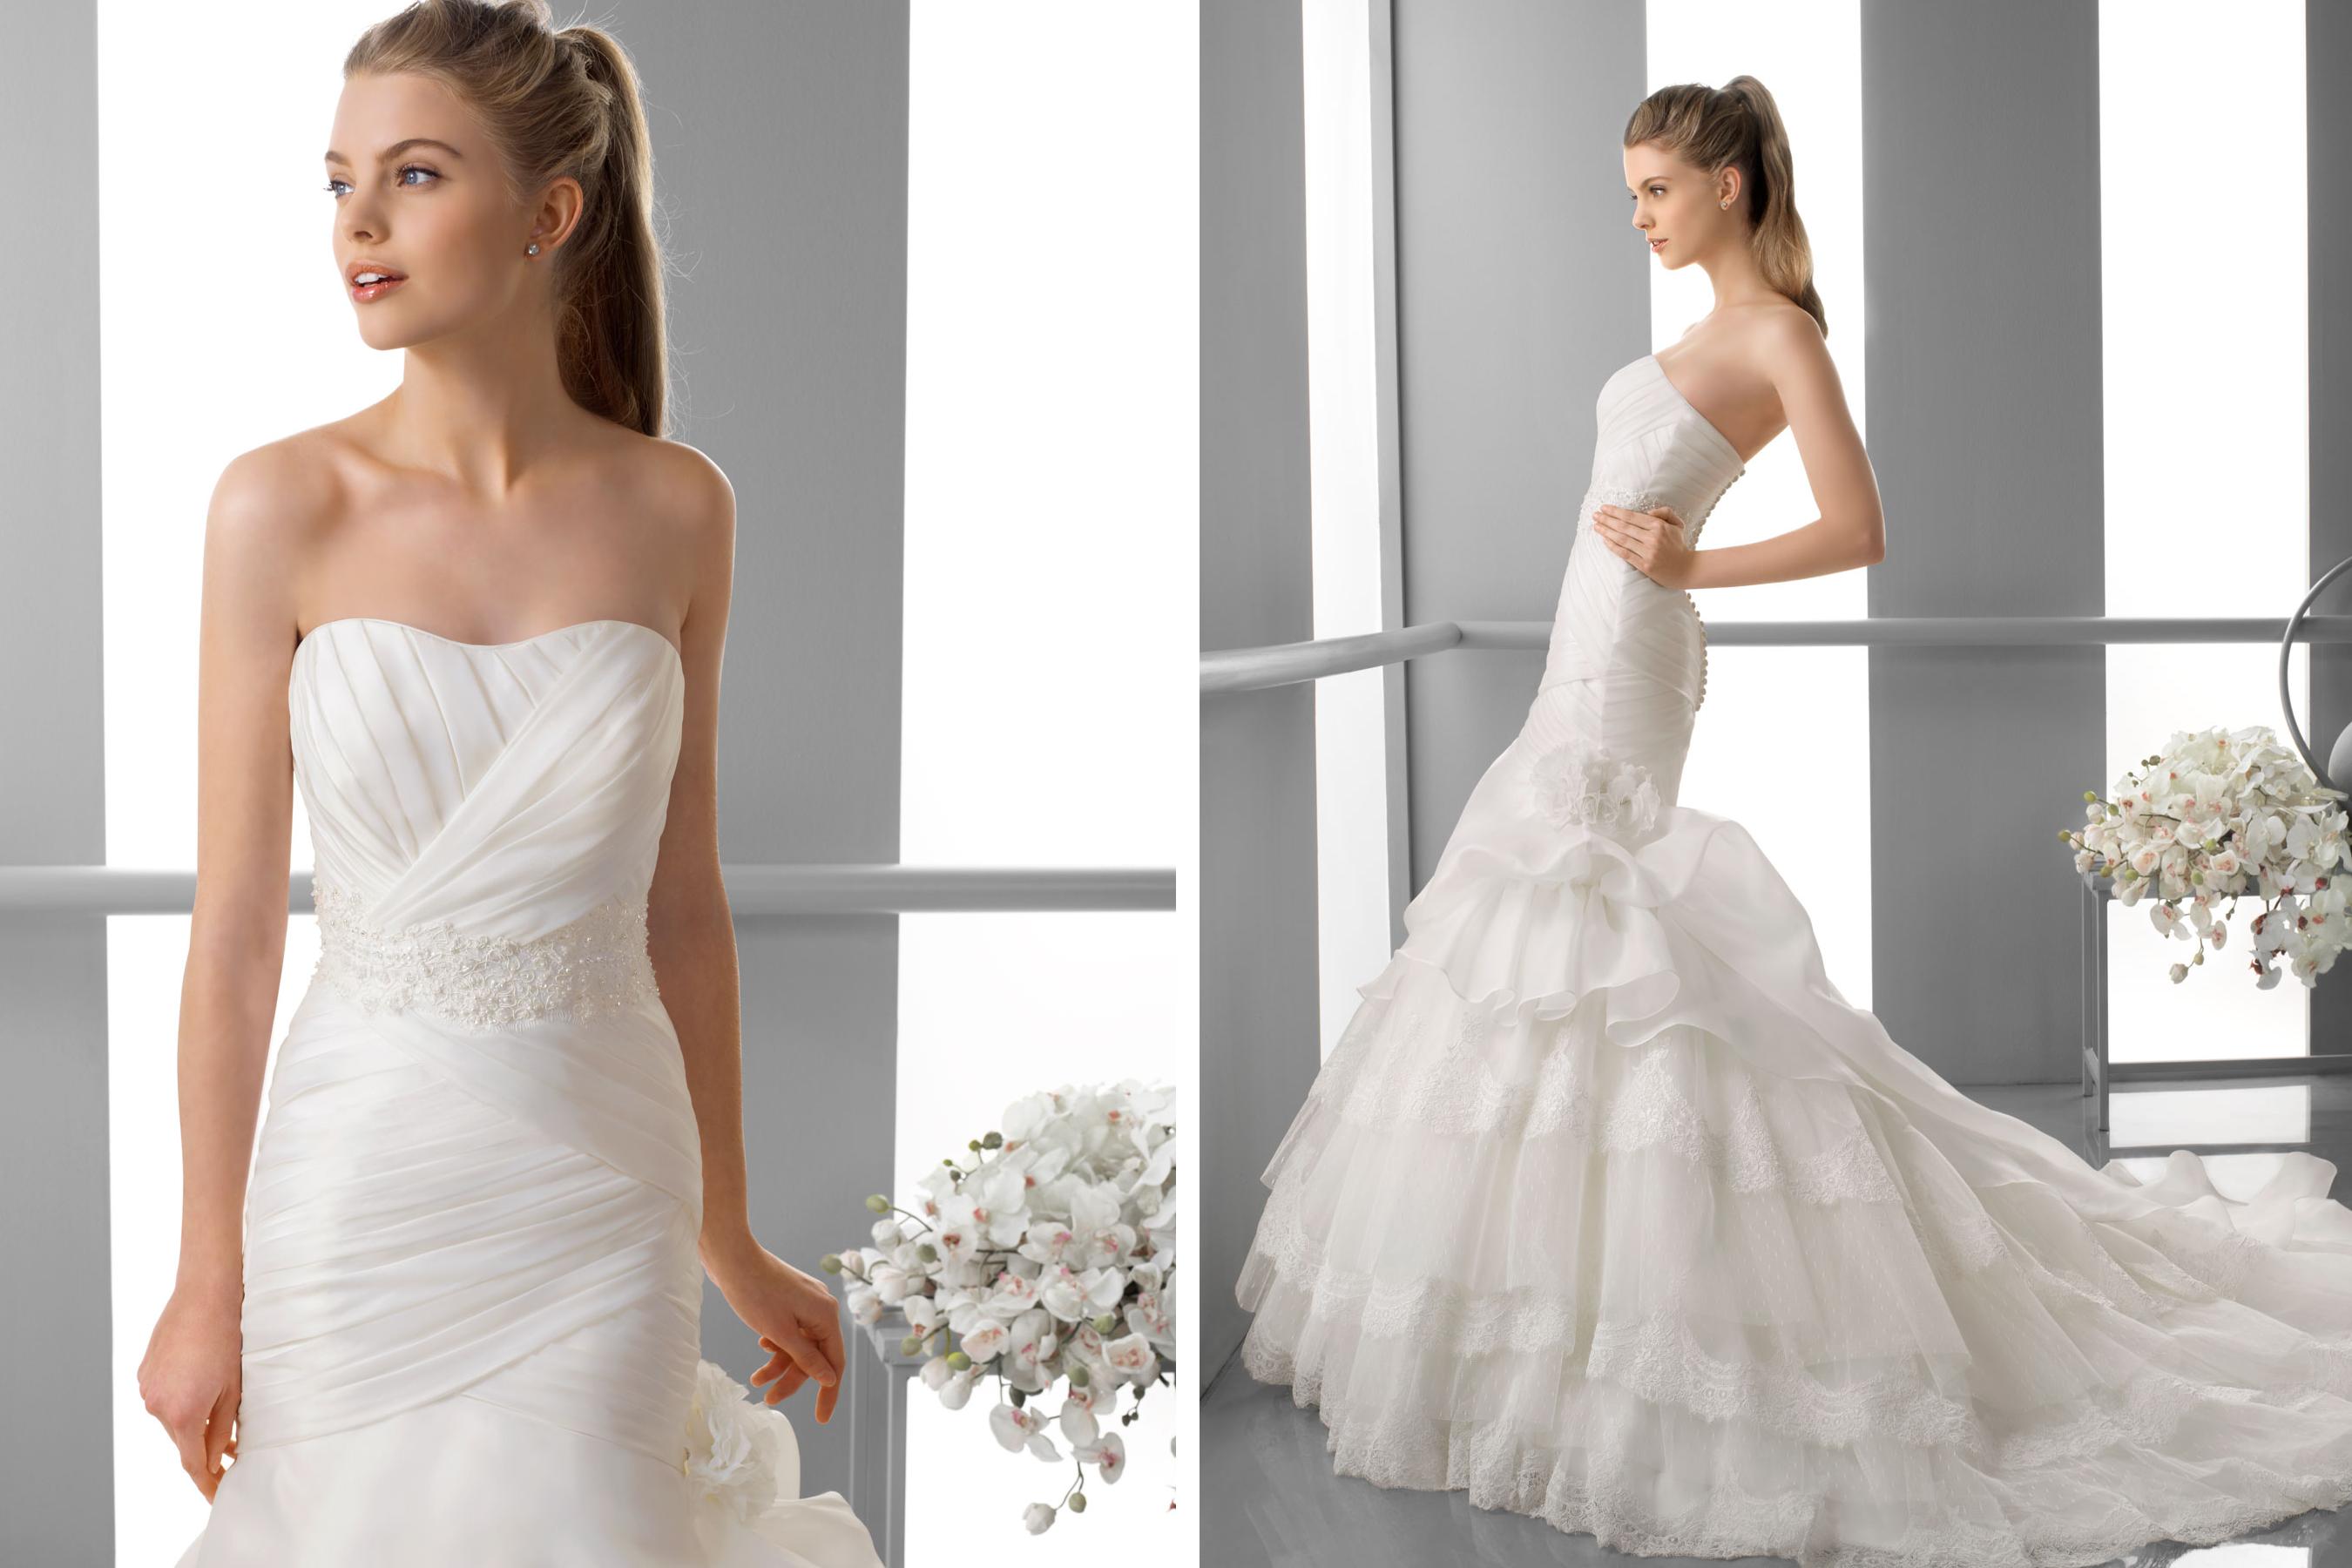 Alma novia wedding dress 2013 bridal flandes for Alma novia wedding dress